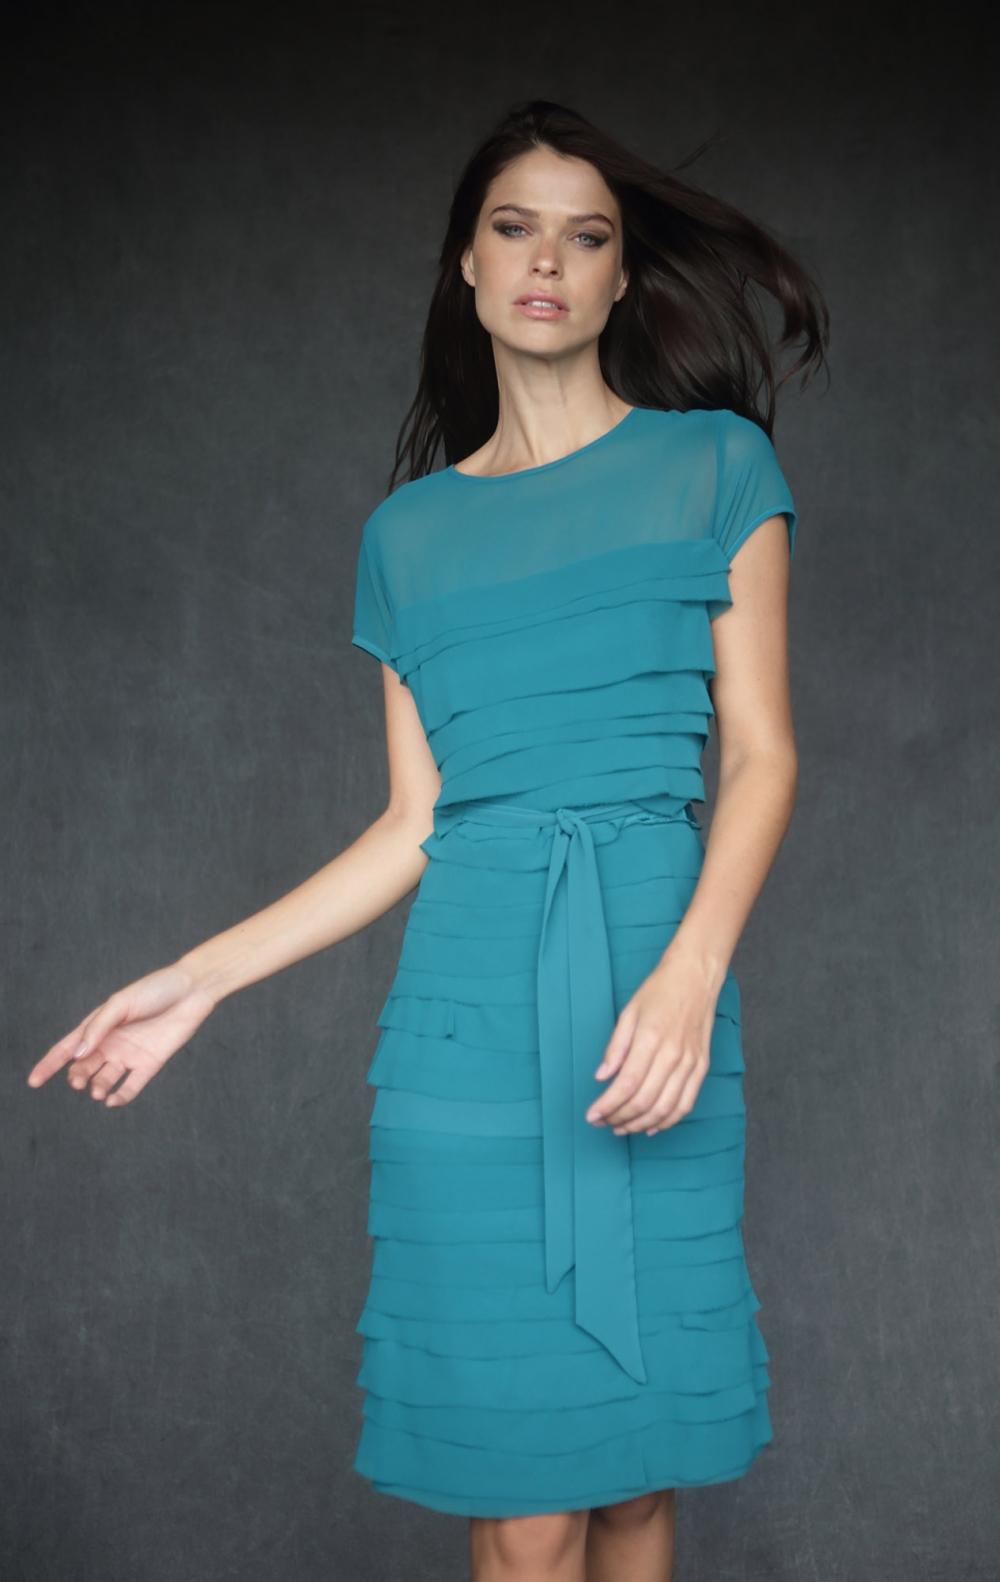 Vestido Donna Turkey - Foto 1